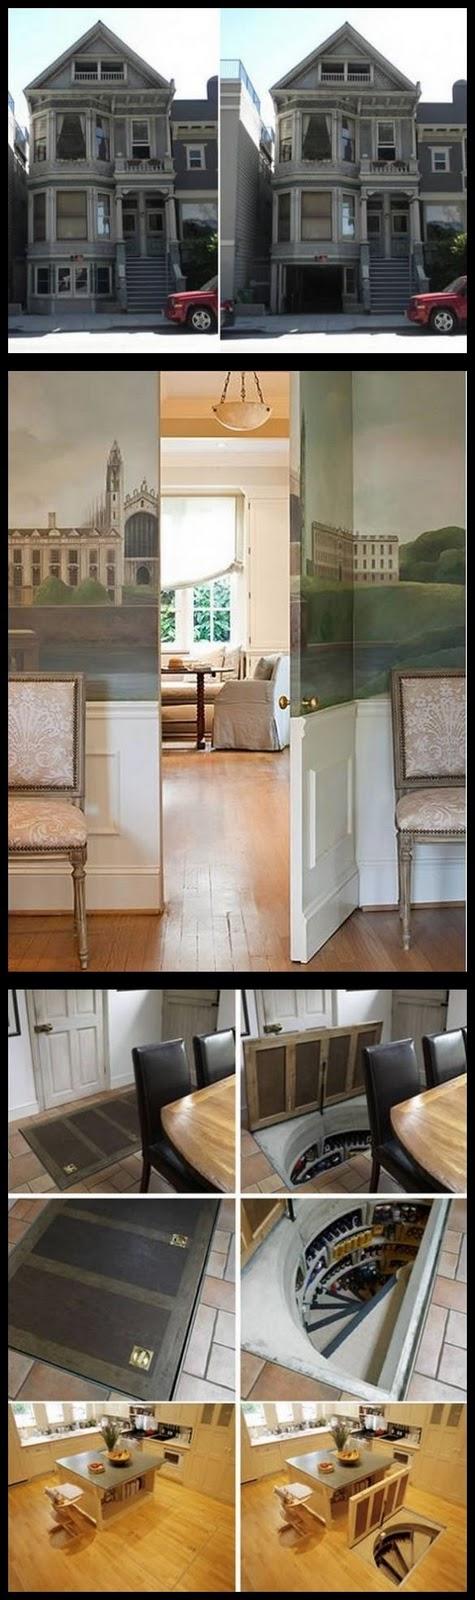 ruangan dengan pintu rahasia